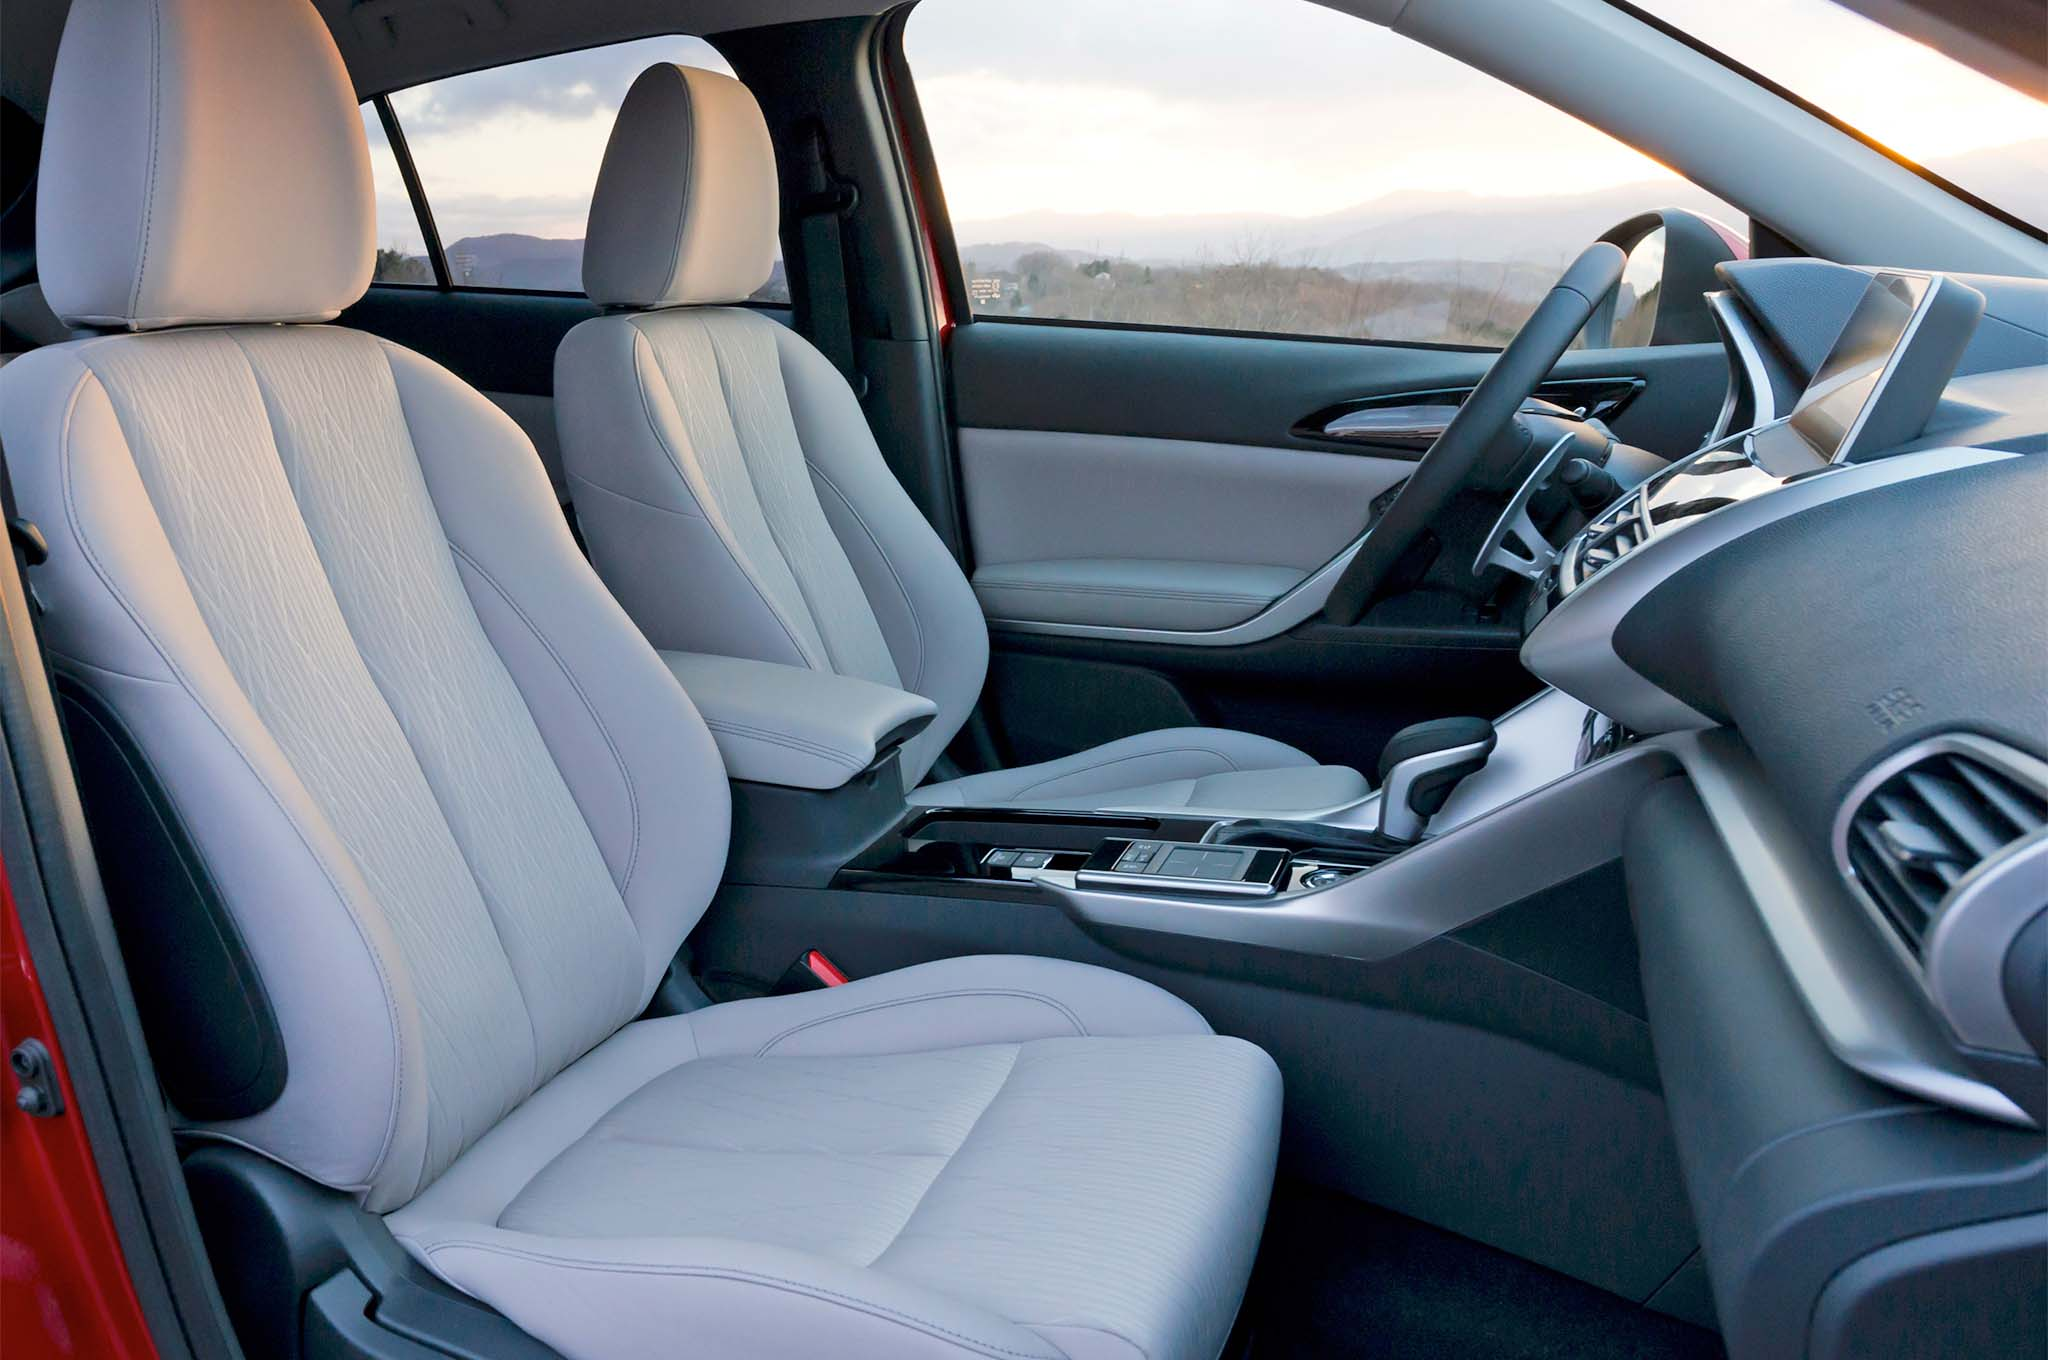 2018 Mitsubishi Eclipse Cross Front Interior Seats 02 1